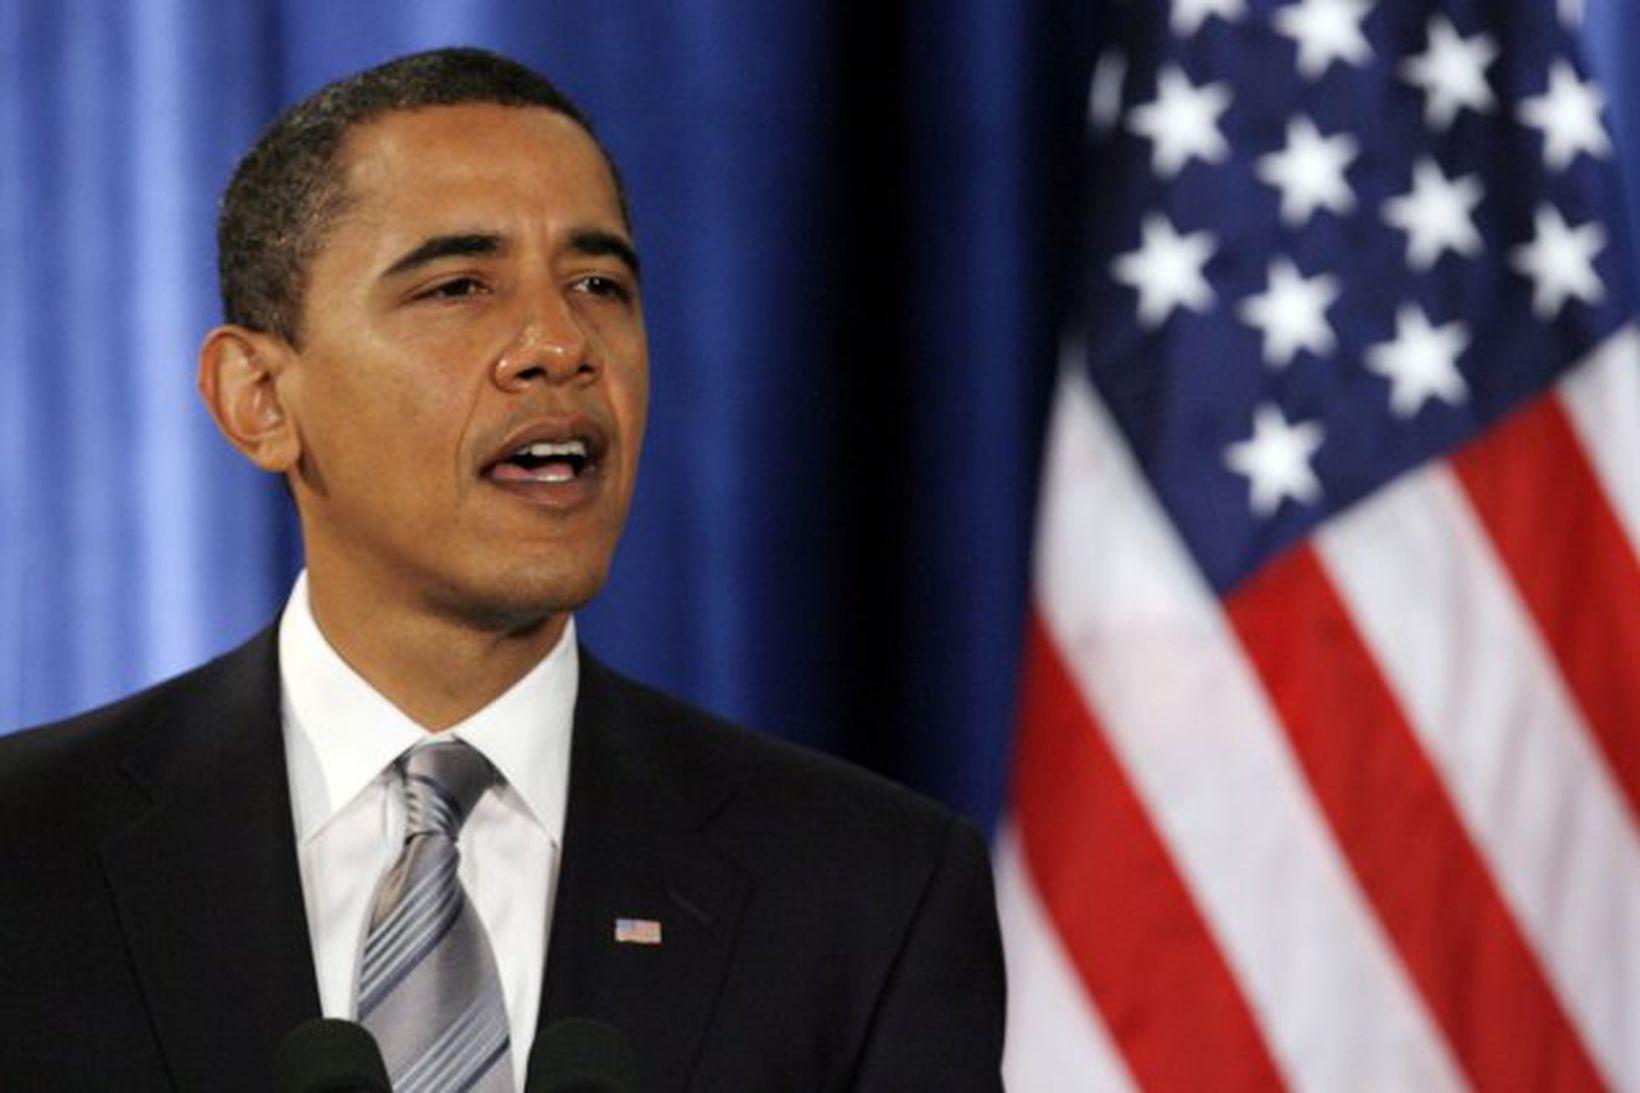 Verður Obama reyklaus forseti?